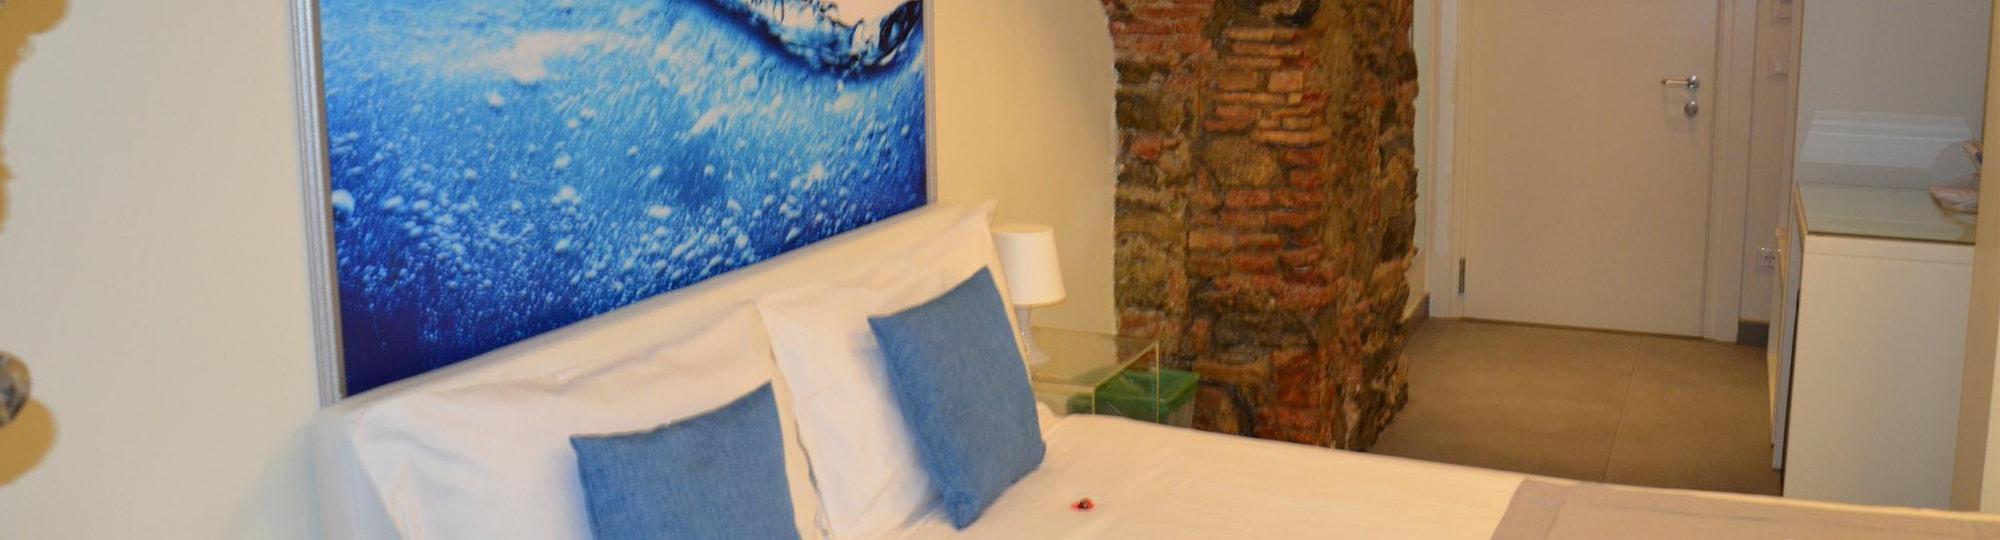 Vue de l'hotel Avenue Hotel 4* à Como